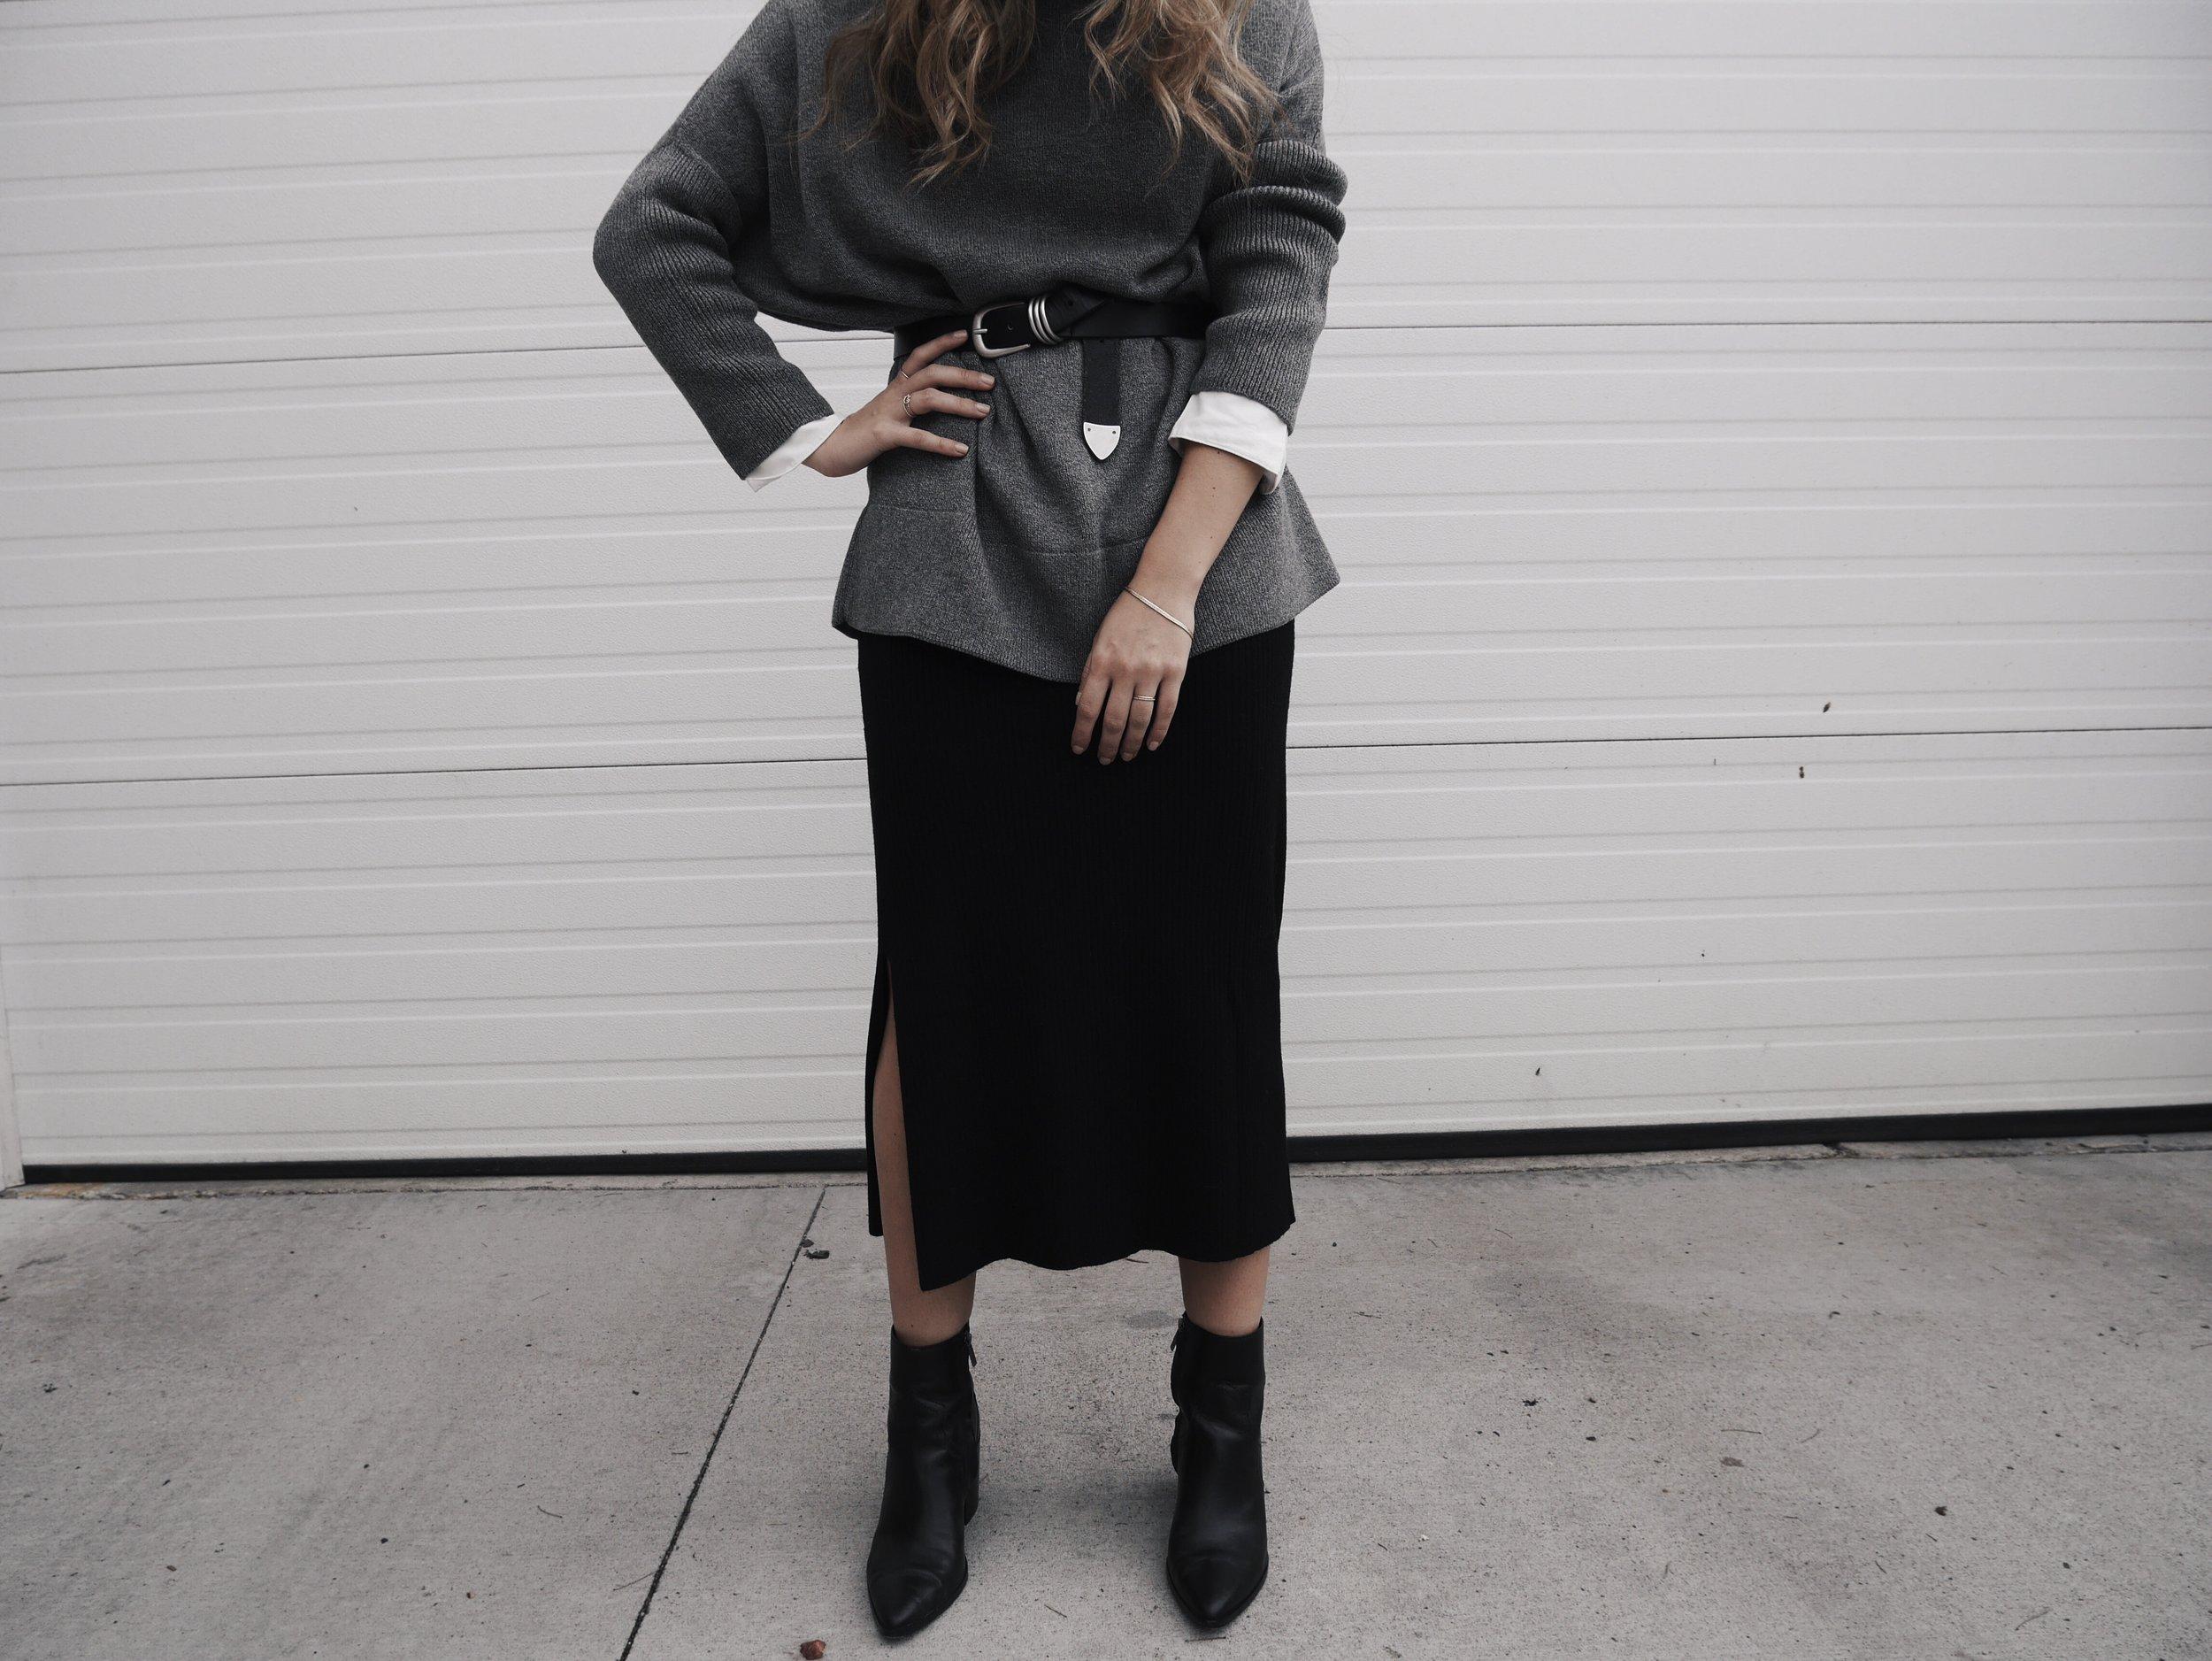 Jessica-Lambi-Vetta-Capsule-Minimalist-Collection.jpg